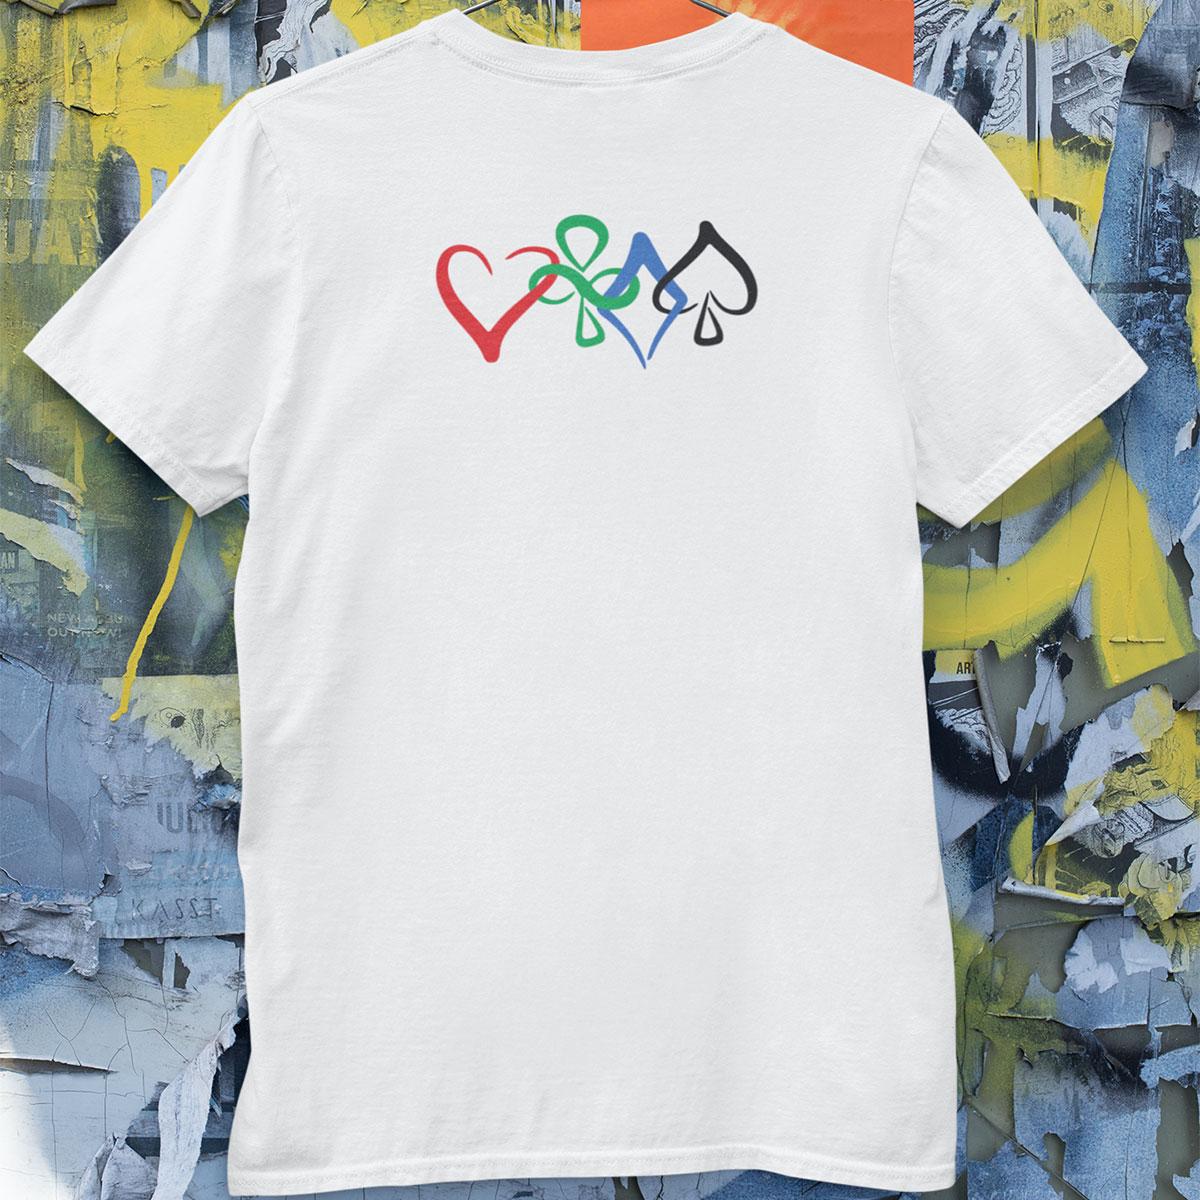 Unity T-Shirt Mockup